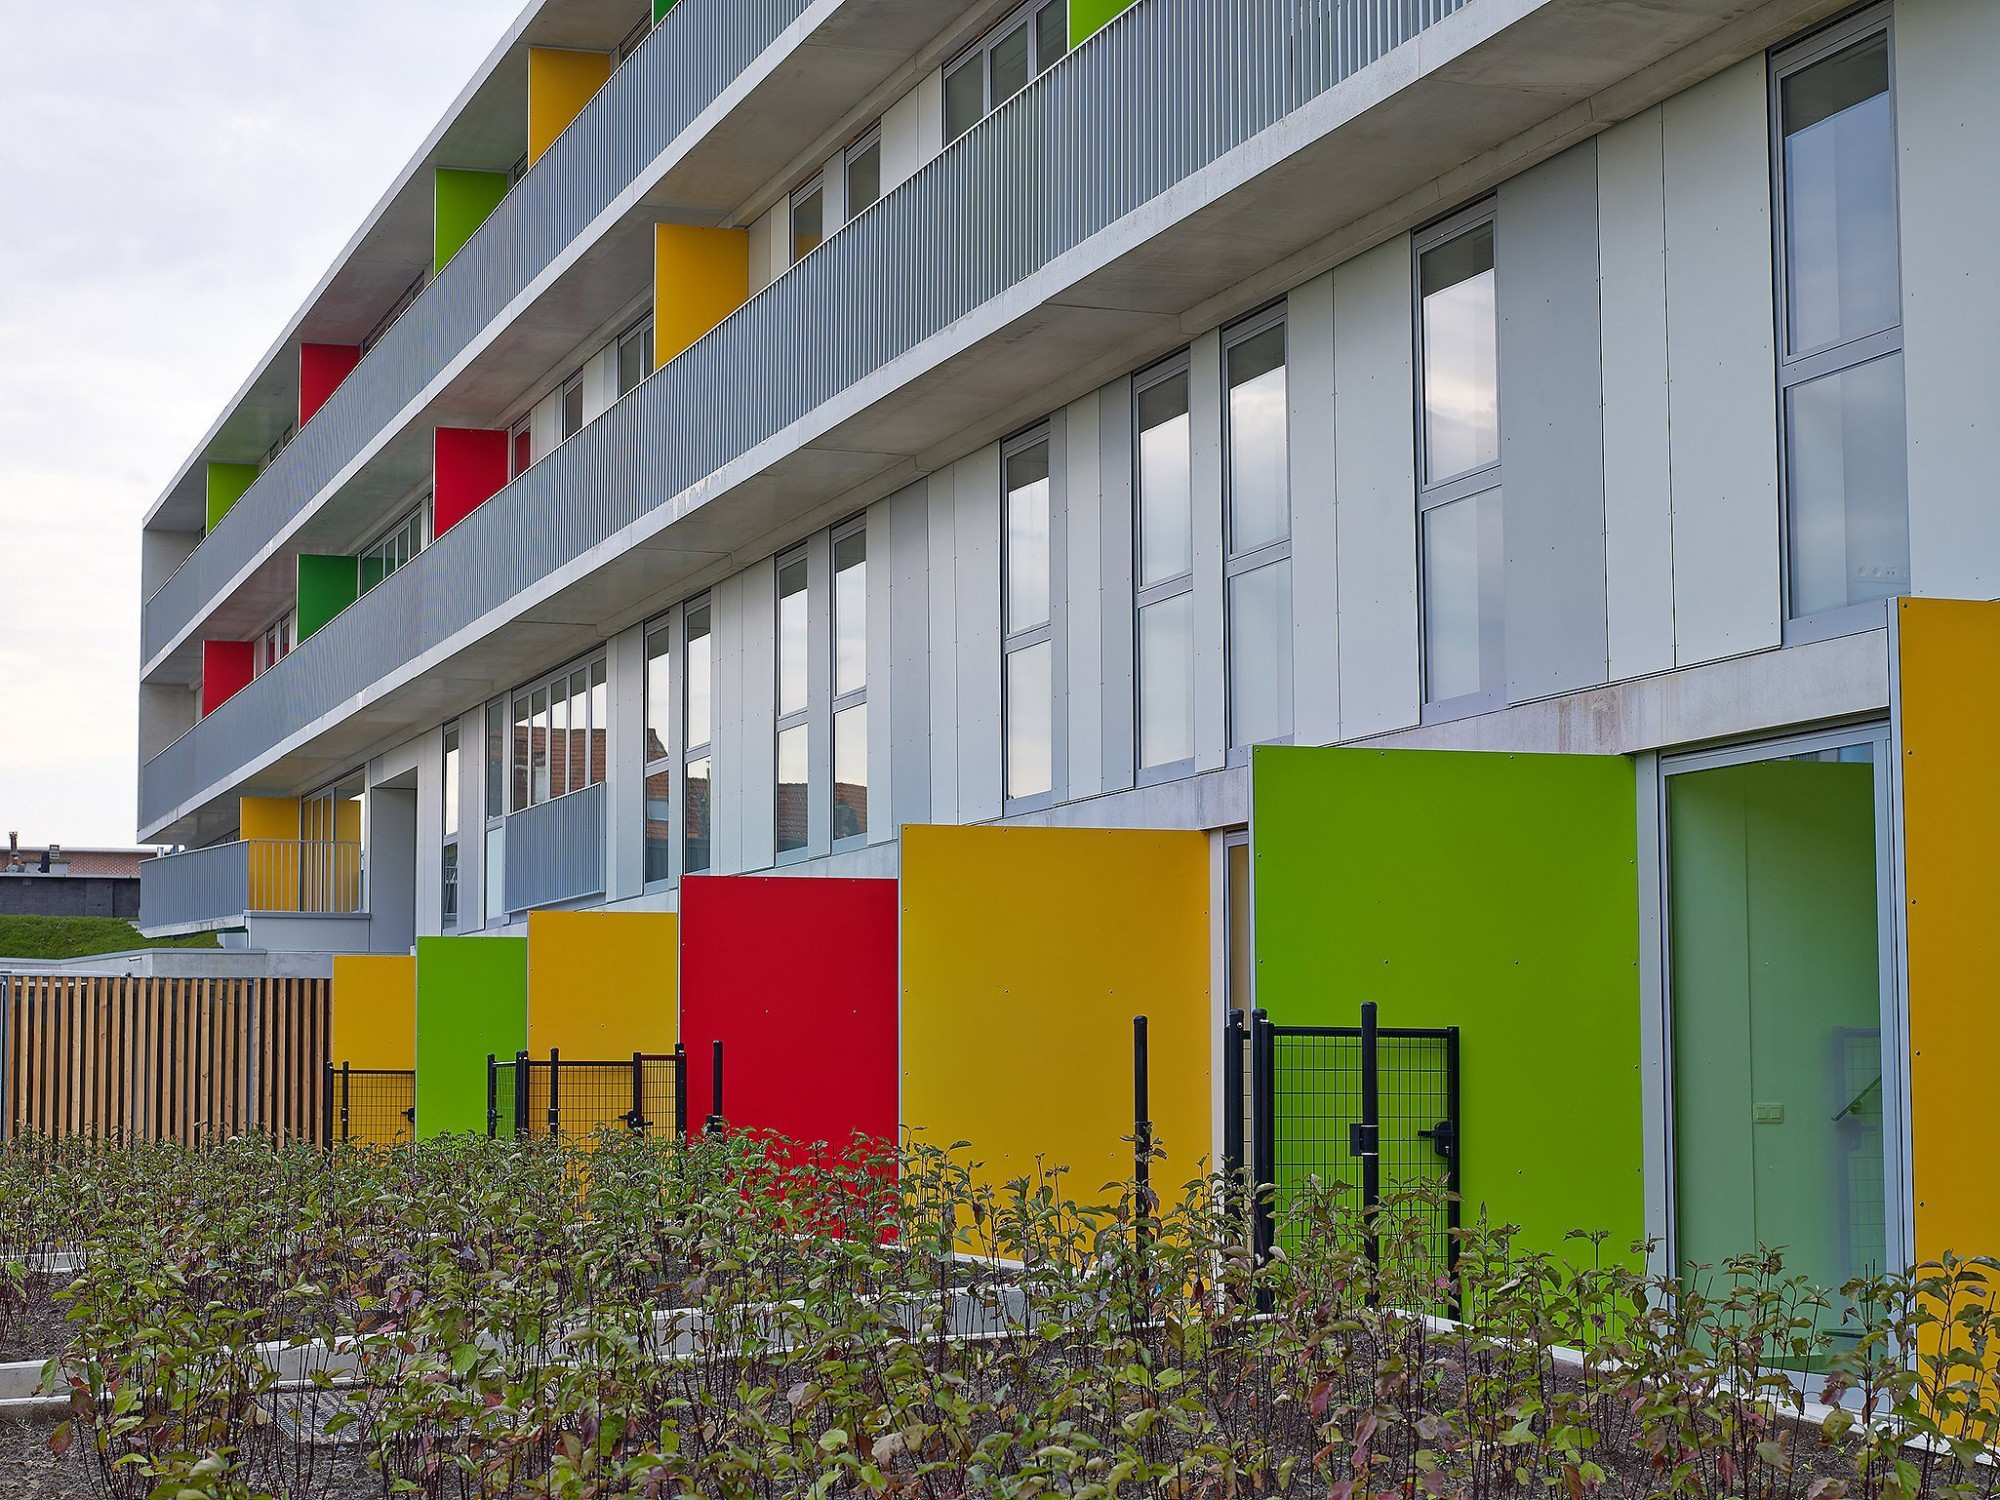 Afbeelding: Architectuur fotografie, sociale woningen, woonhaven te Deurne, voor Nys -Driesen, © atelier M Architects + Planners.